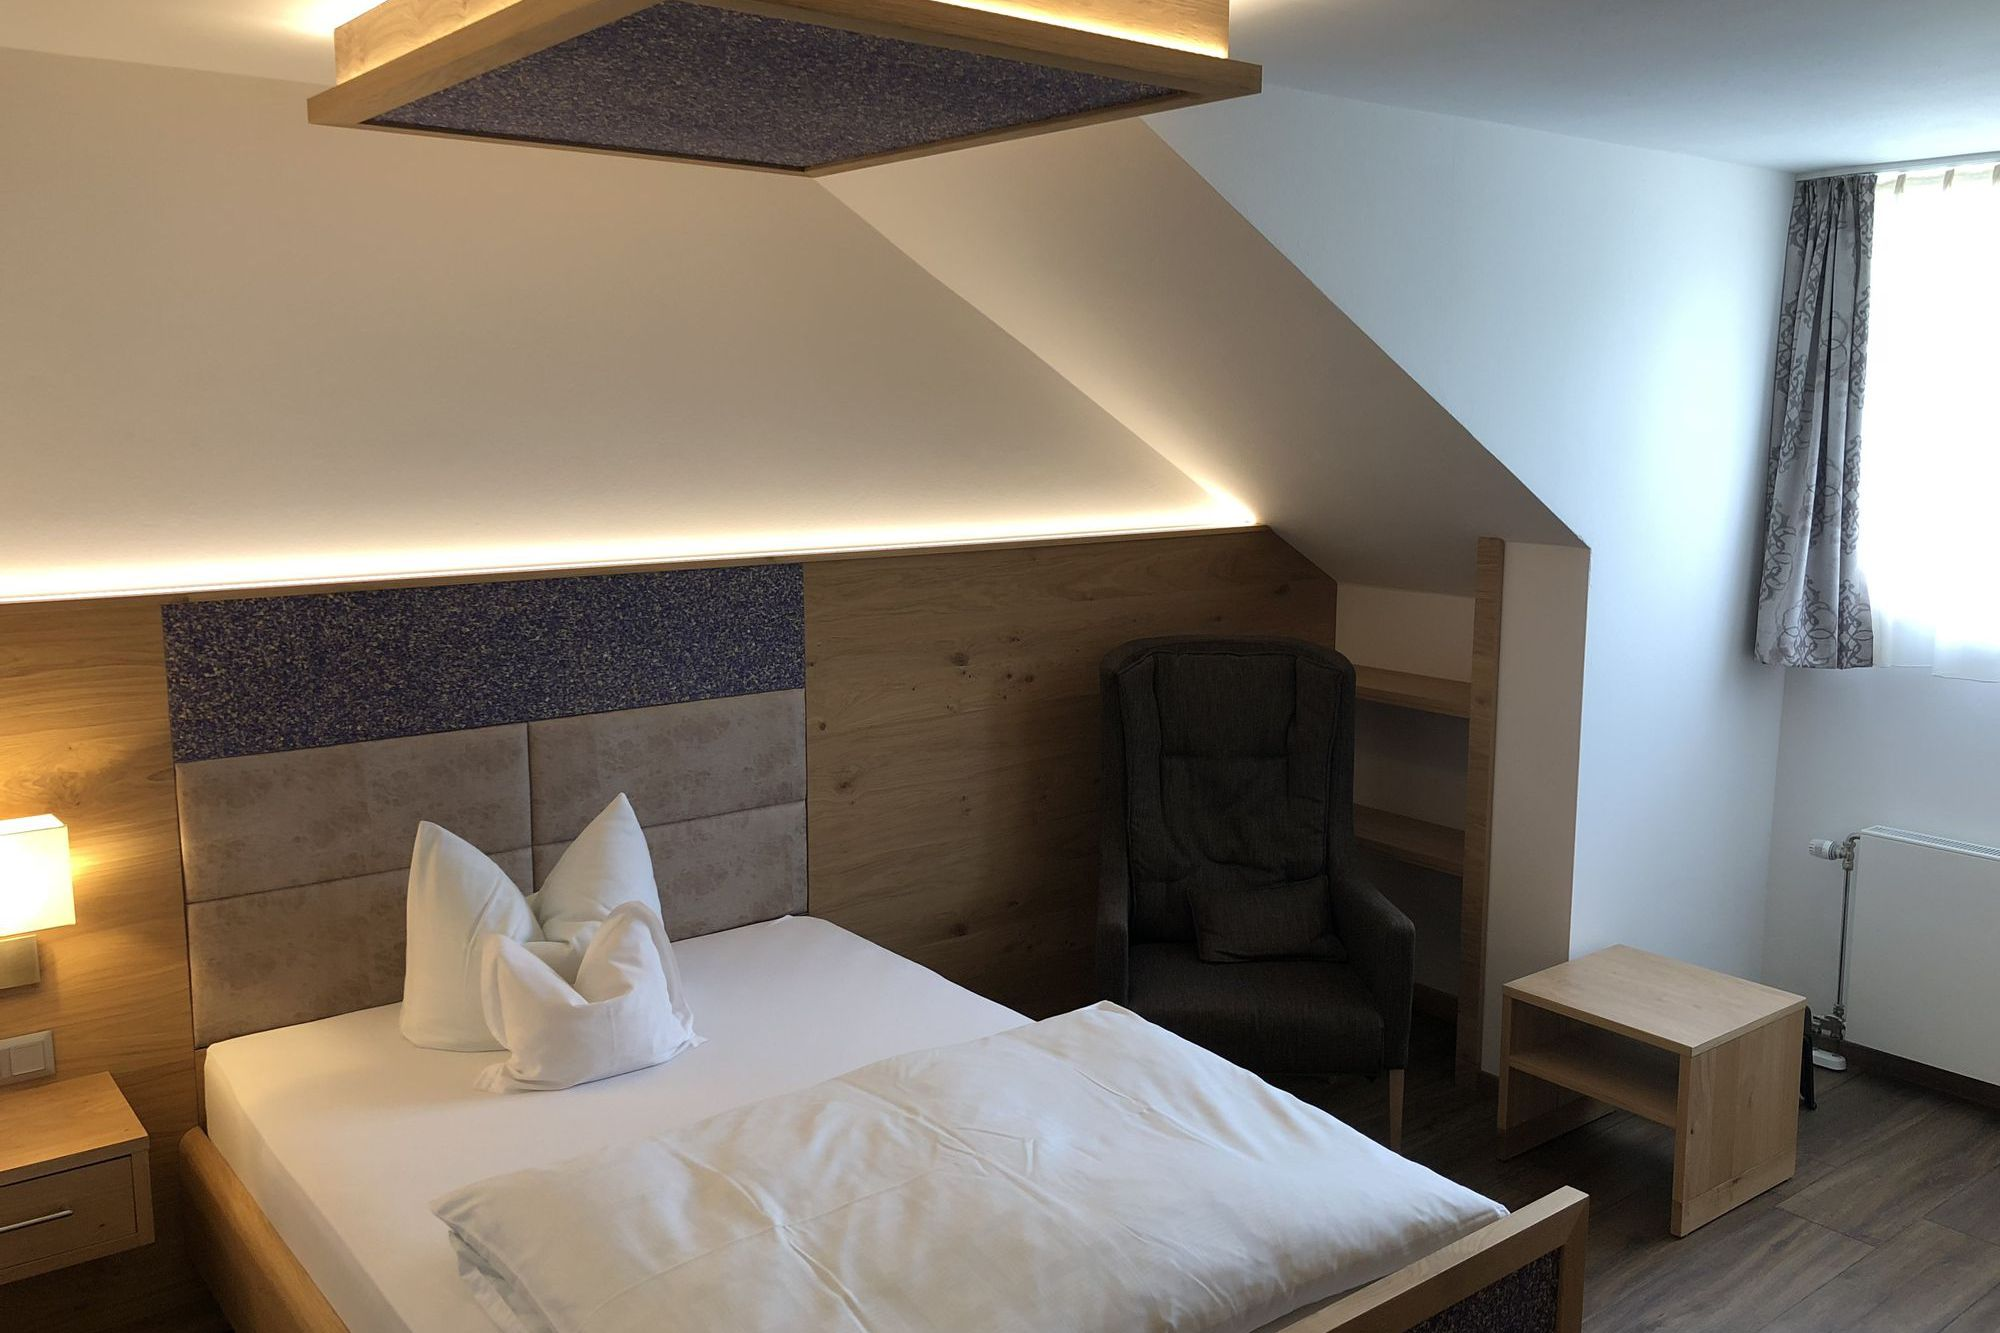 https://www.hotelbinder.de/wp-content/uploads/einzelzimmer1_4.jpg